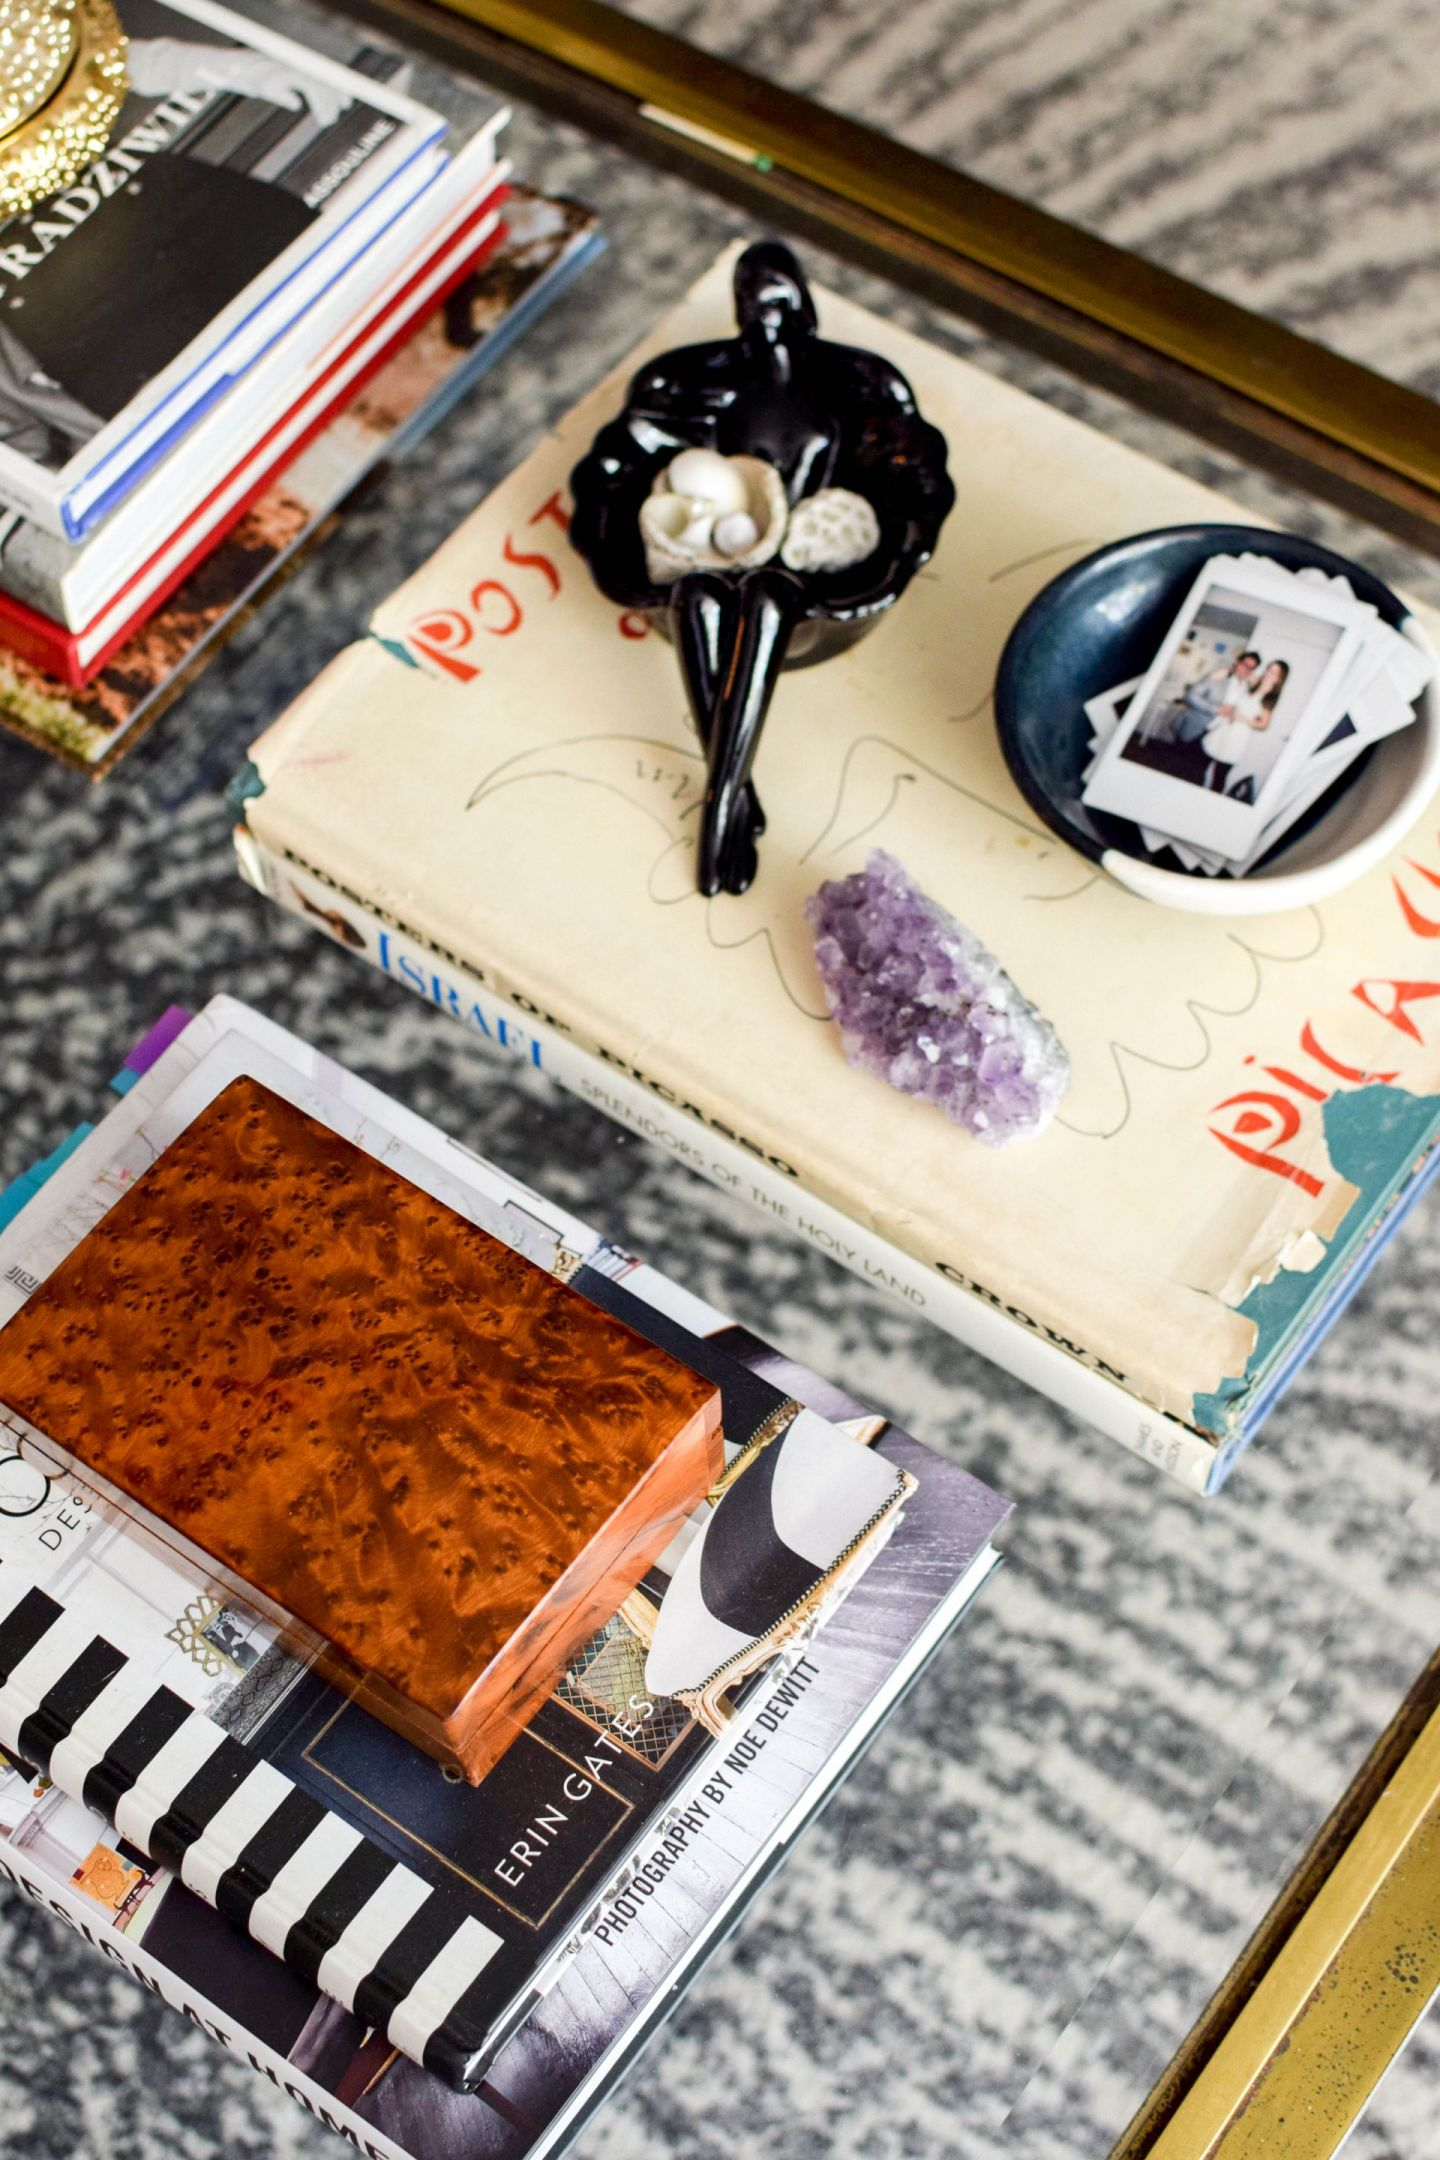 budget friendly decorative items - budget friendly burl wood box - inexpensive burl wood box